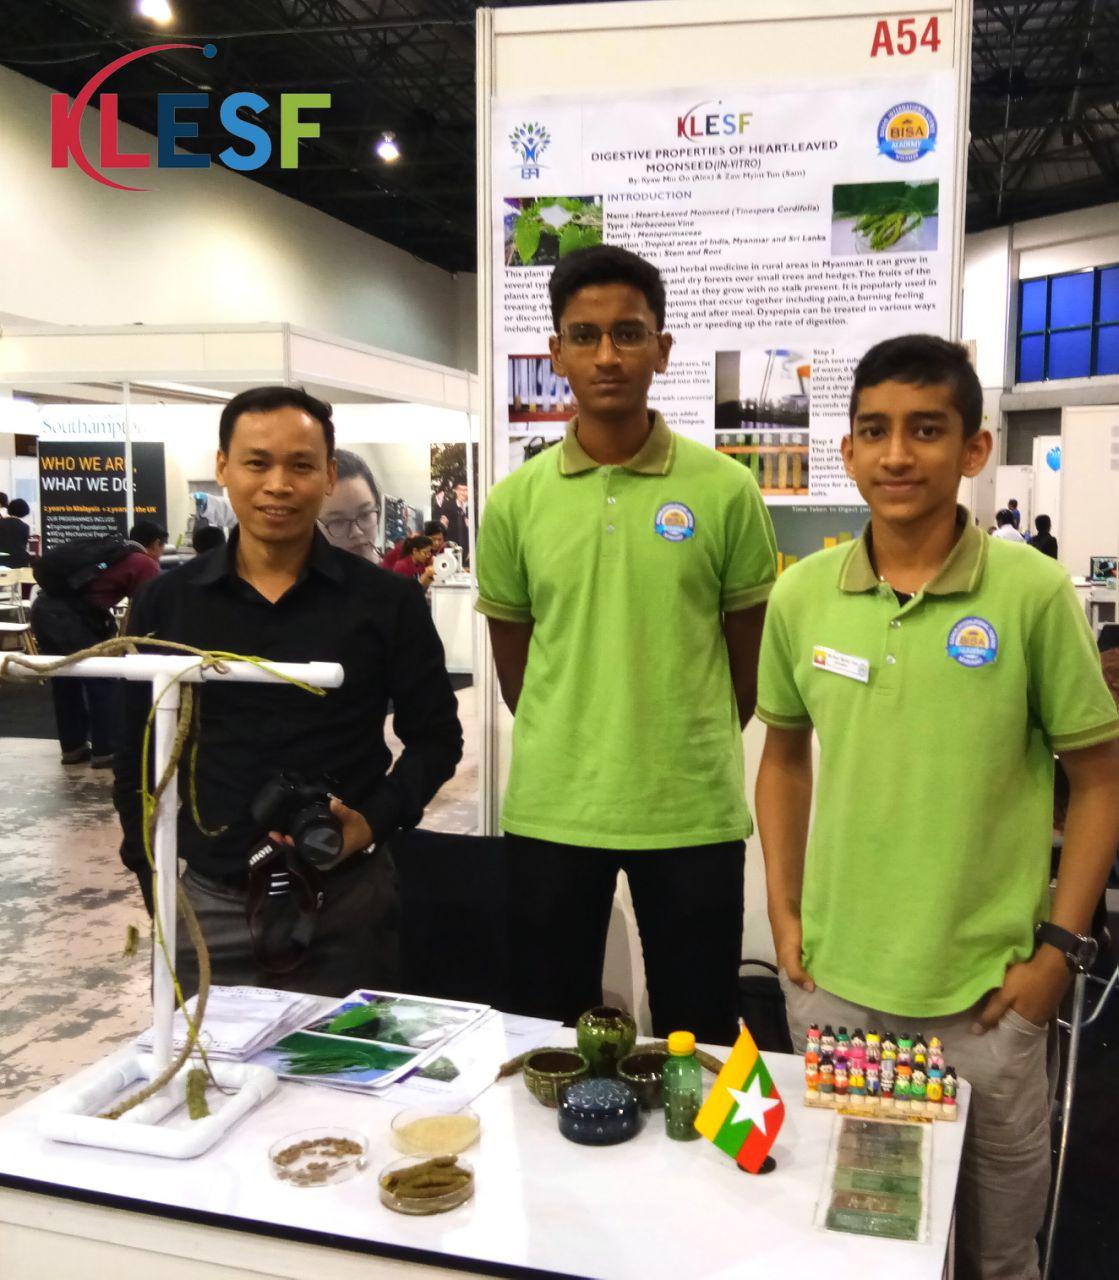 Kuala Lumpur Engineering Science Fair (KLESF)